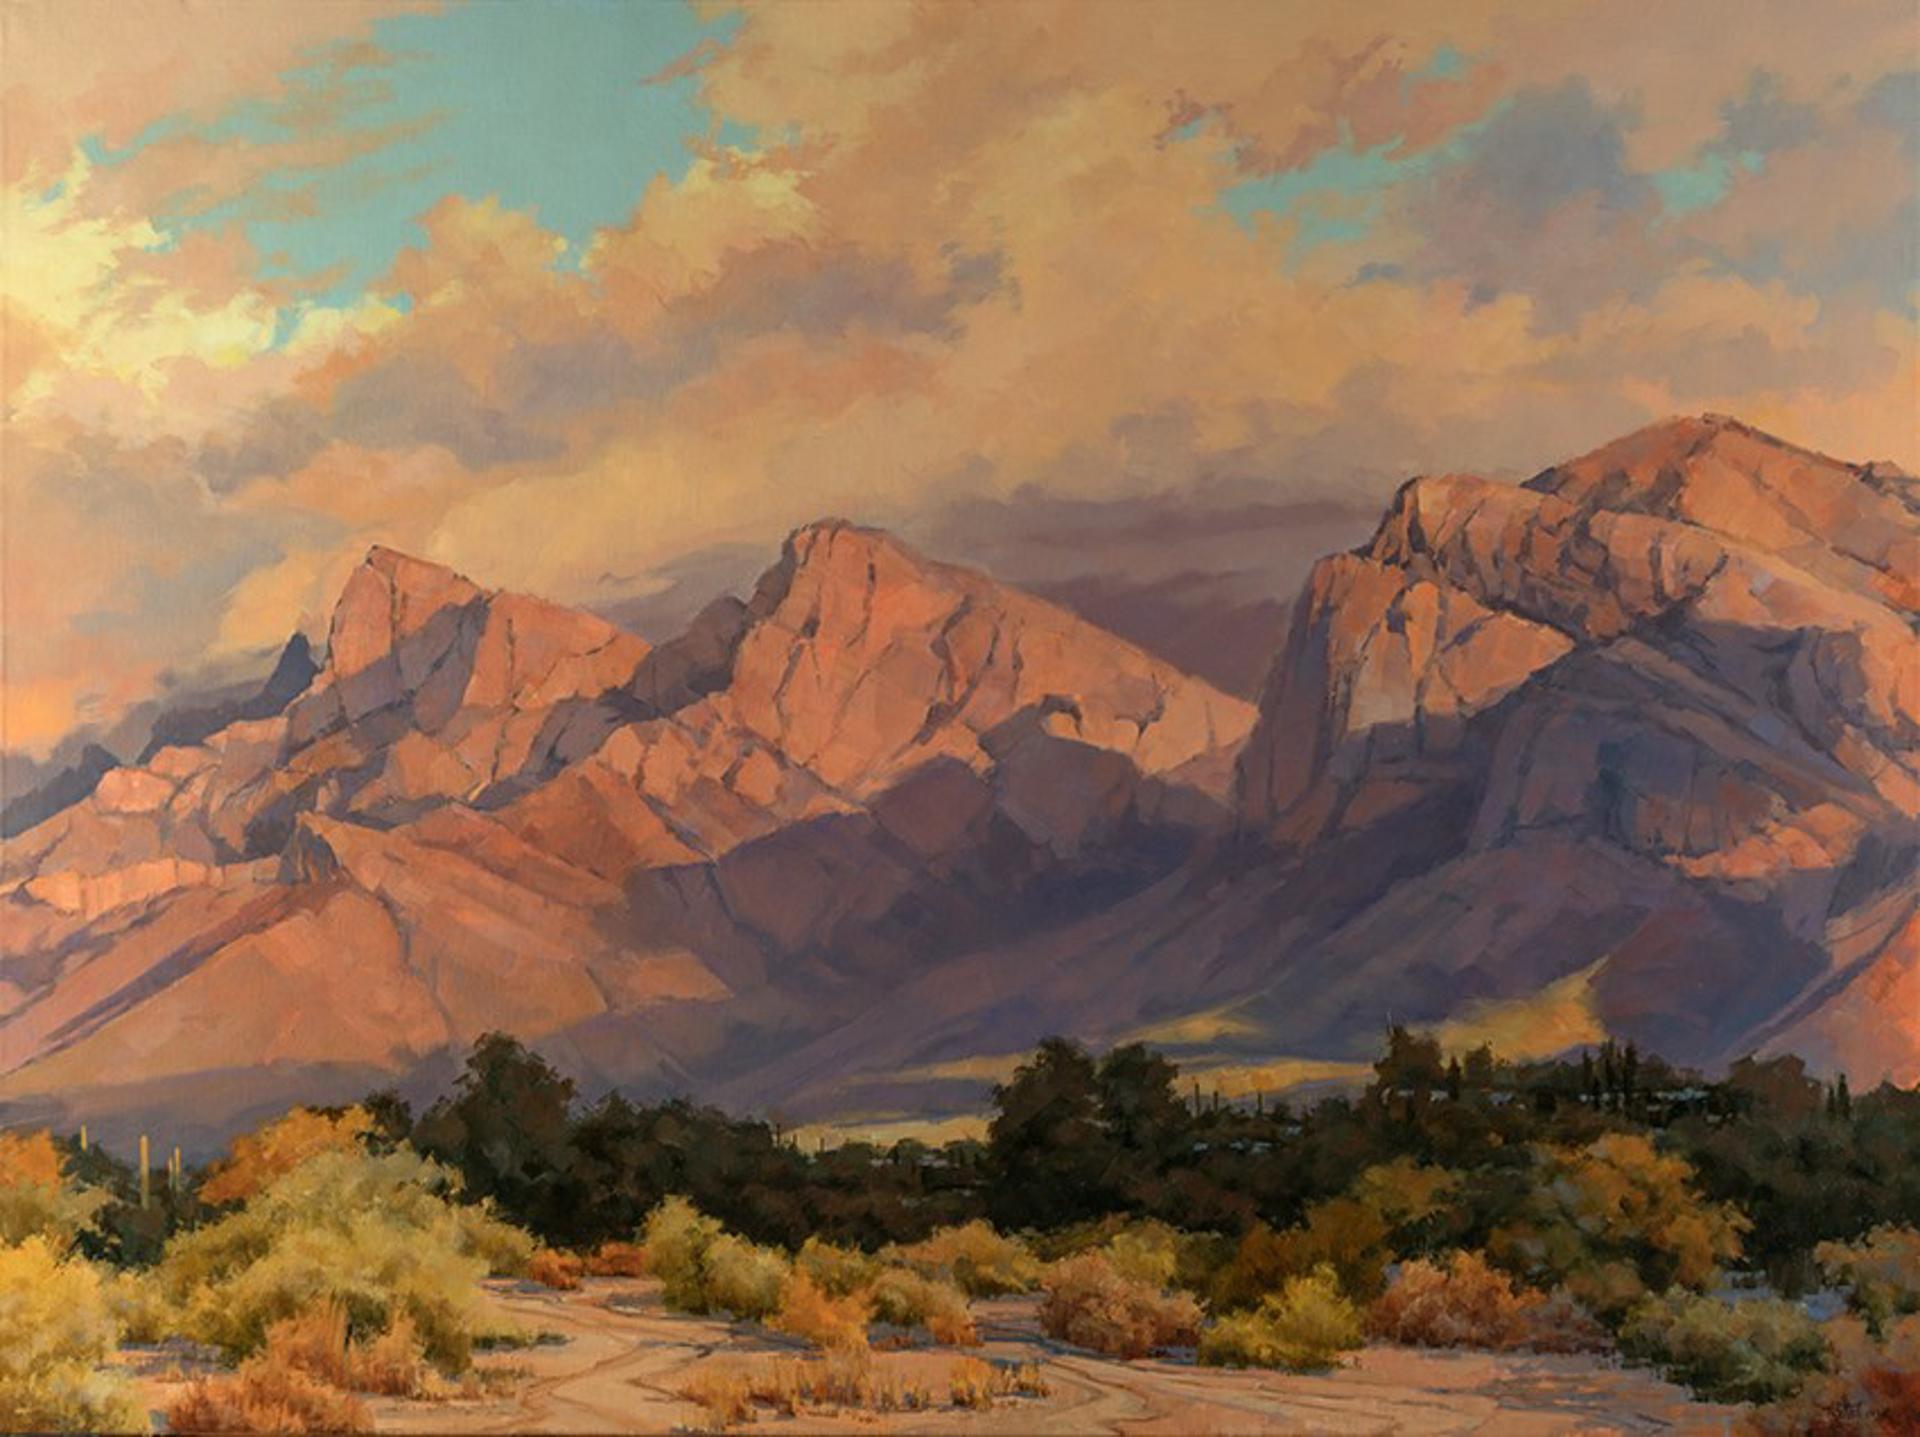 Pastel Desert Dusk by Darcie Peet